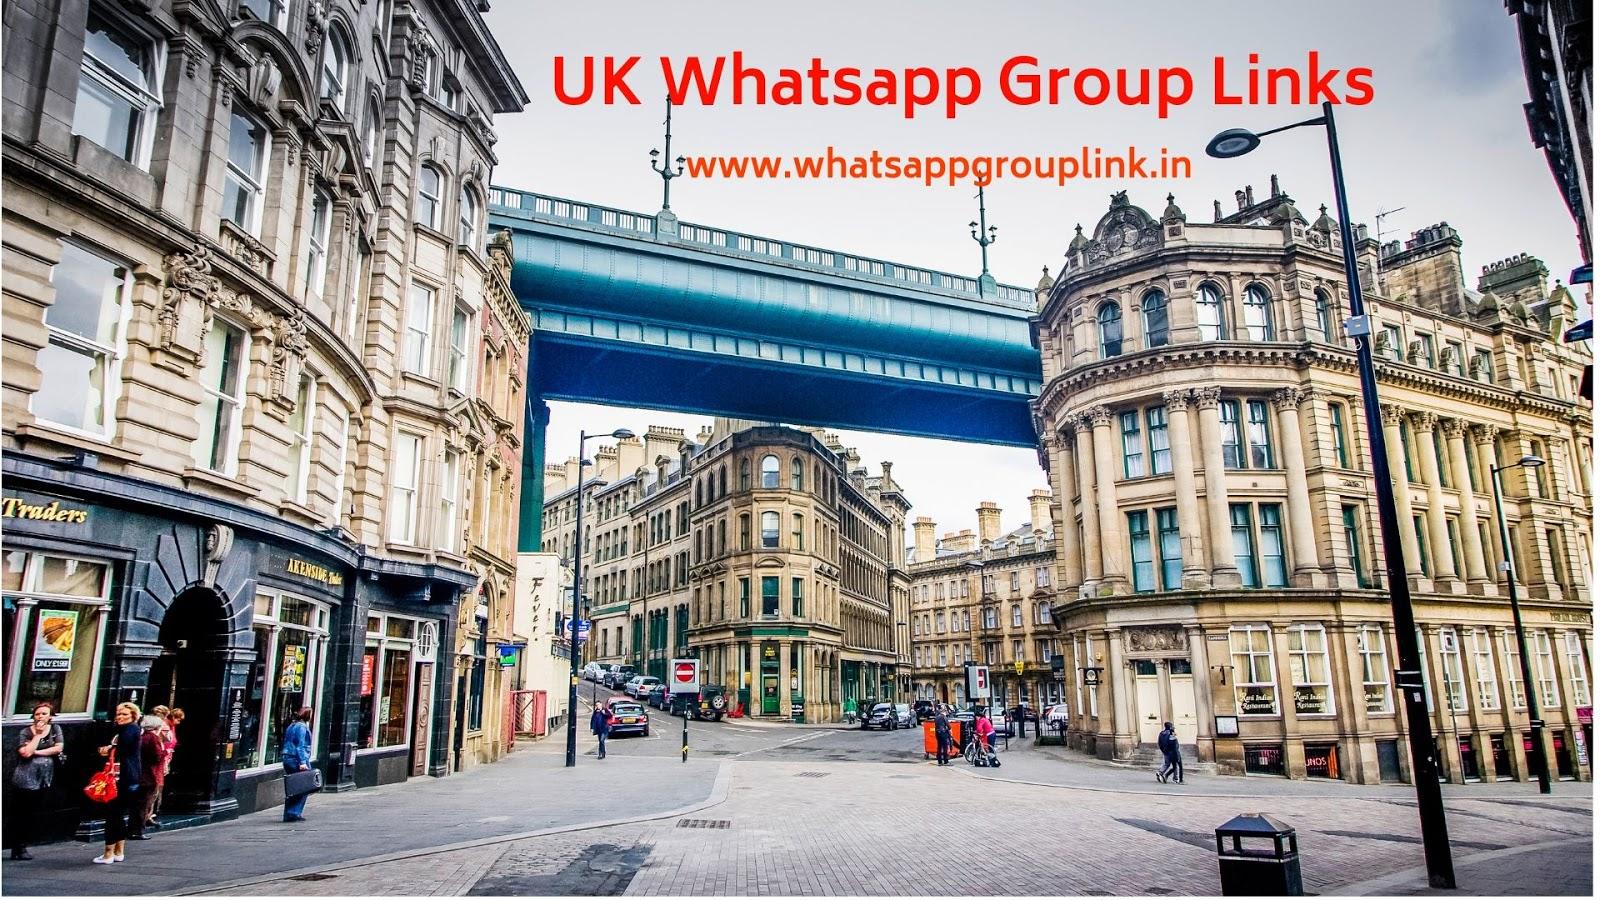 Whatsapp Group Link: UK Whatsapp Group Links